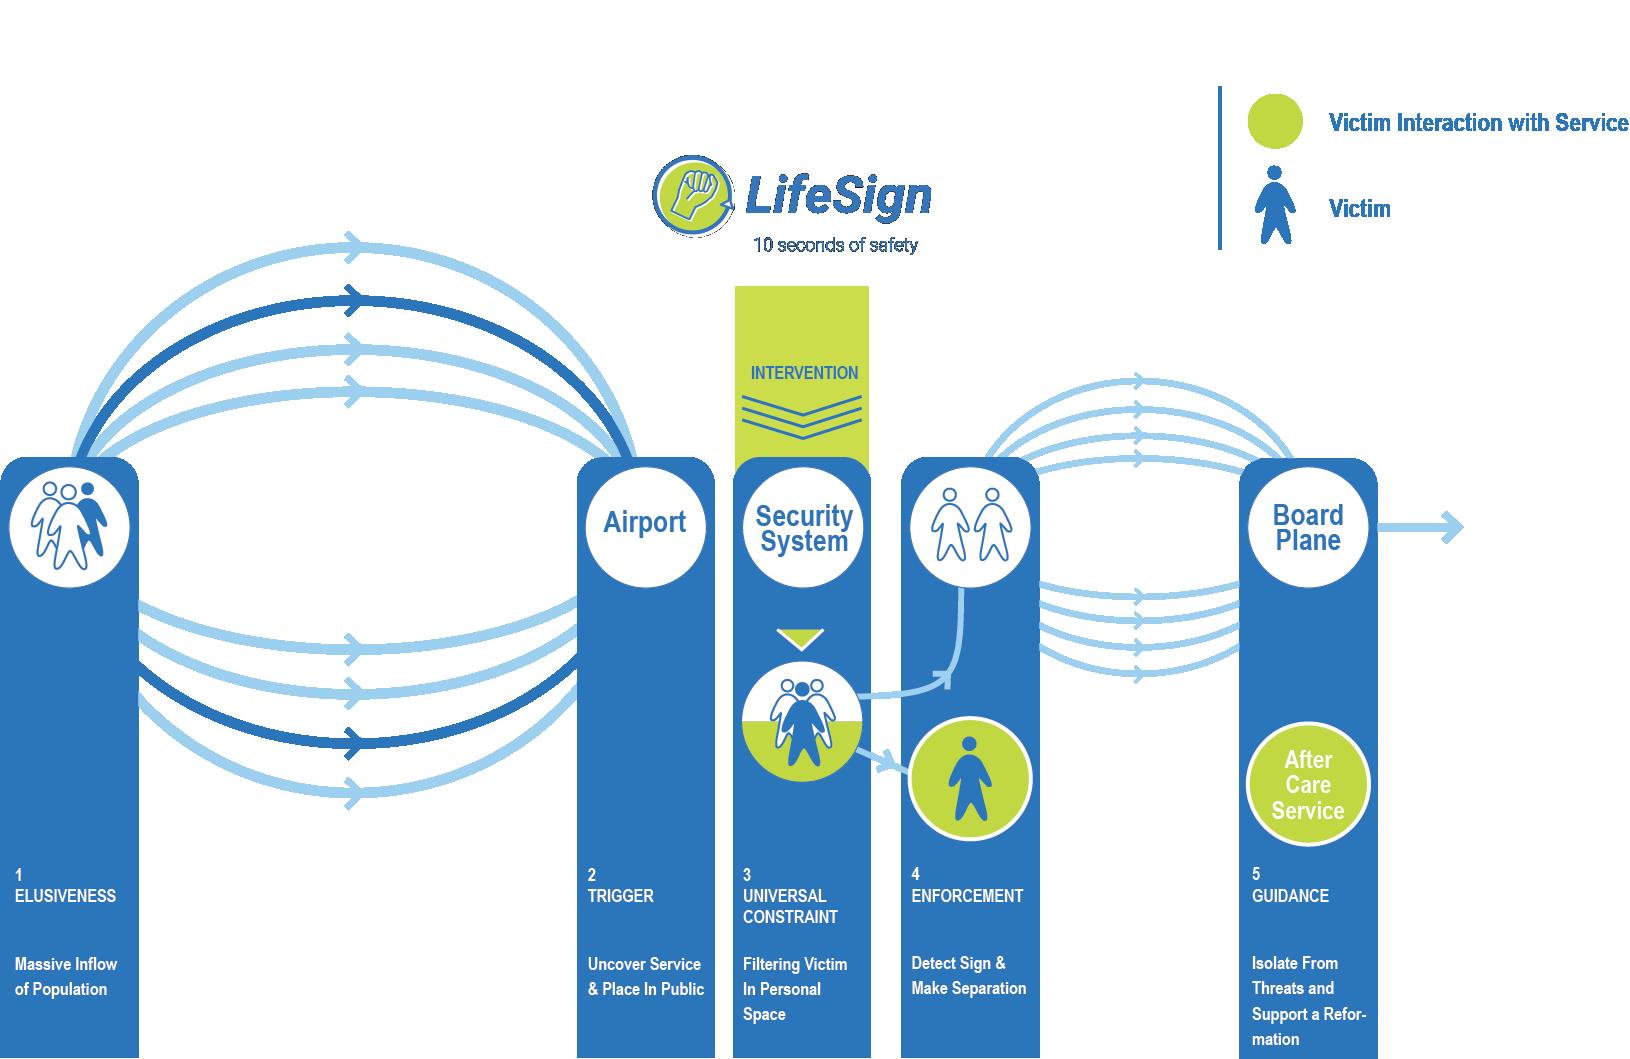 lifesign flow chart1.png